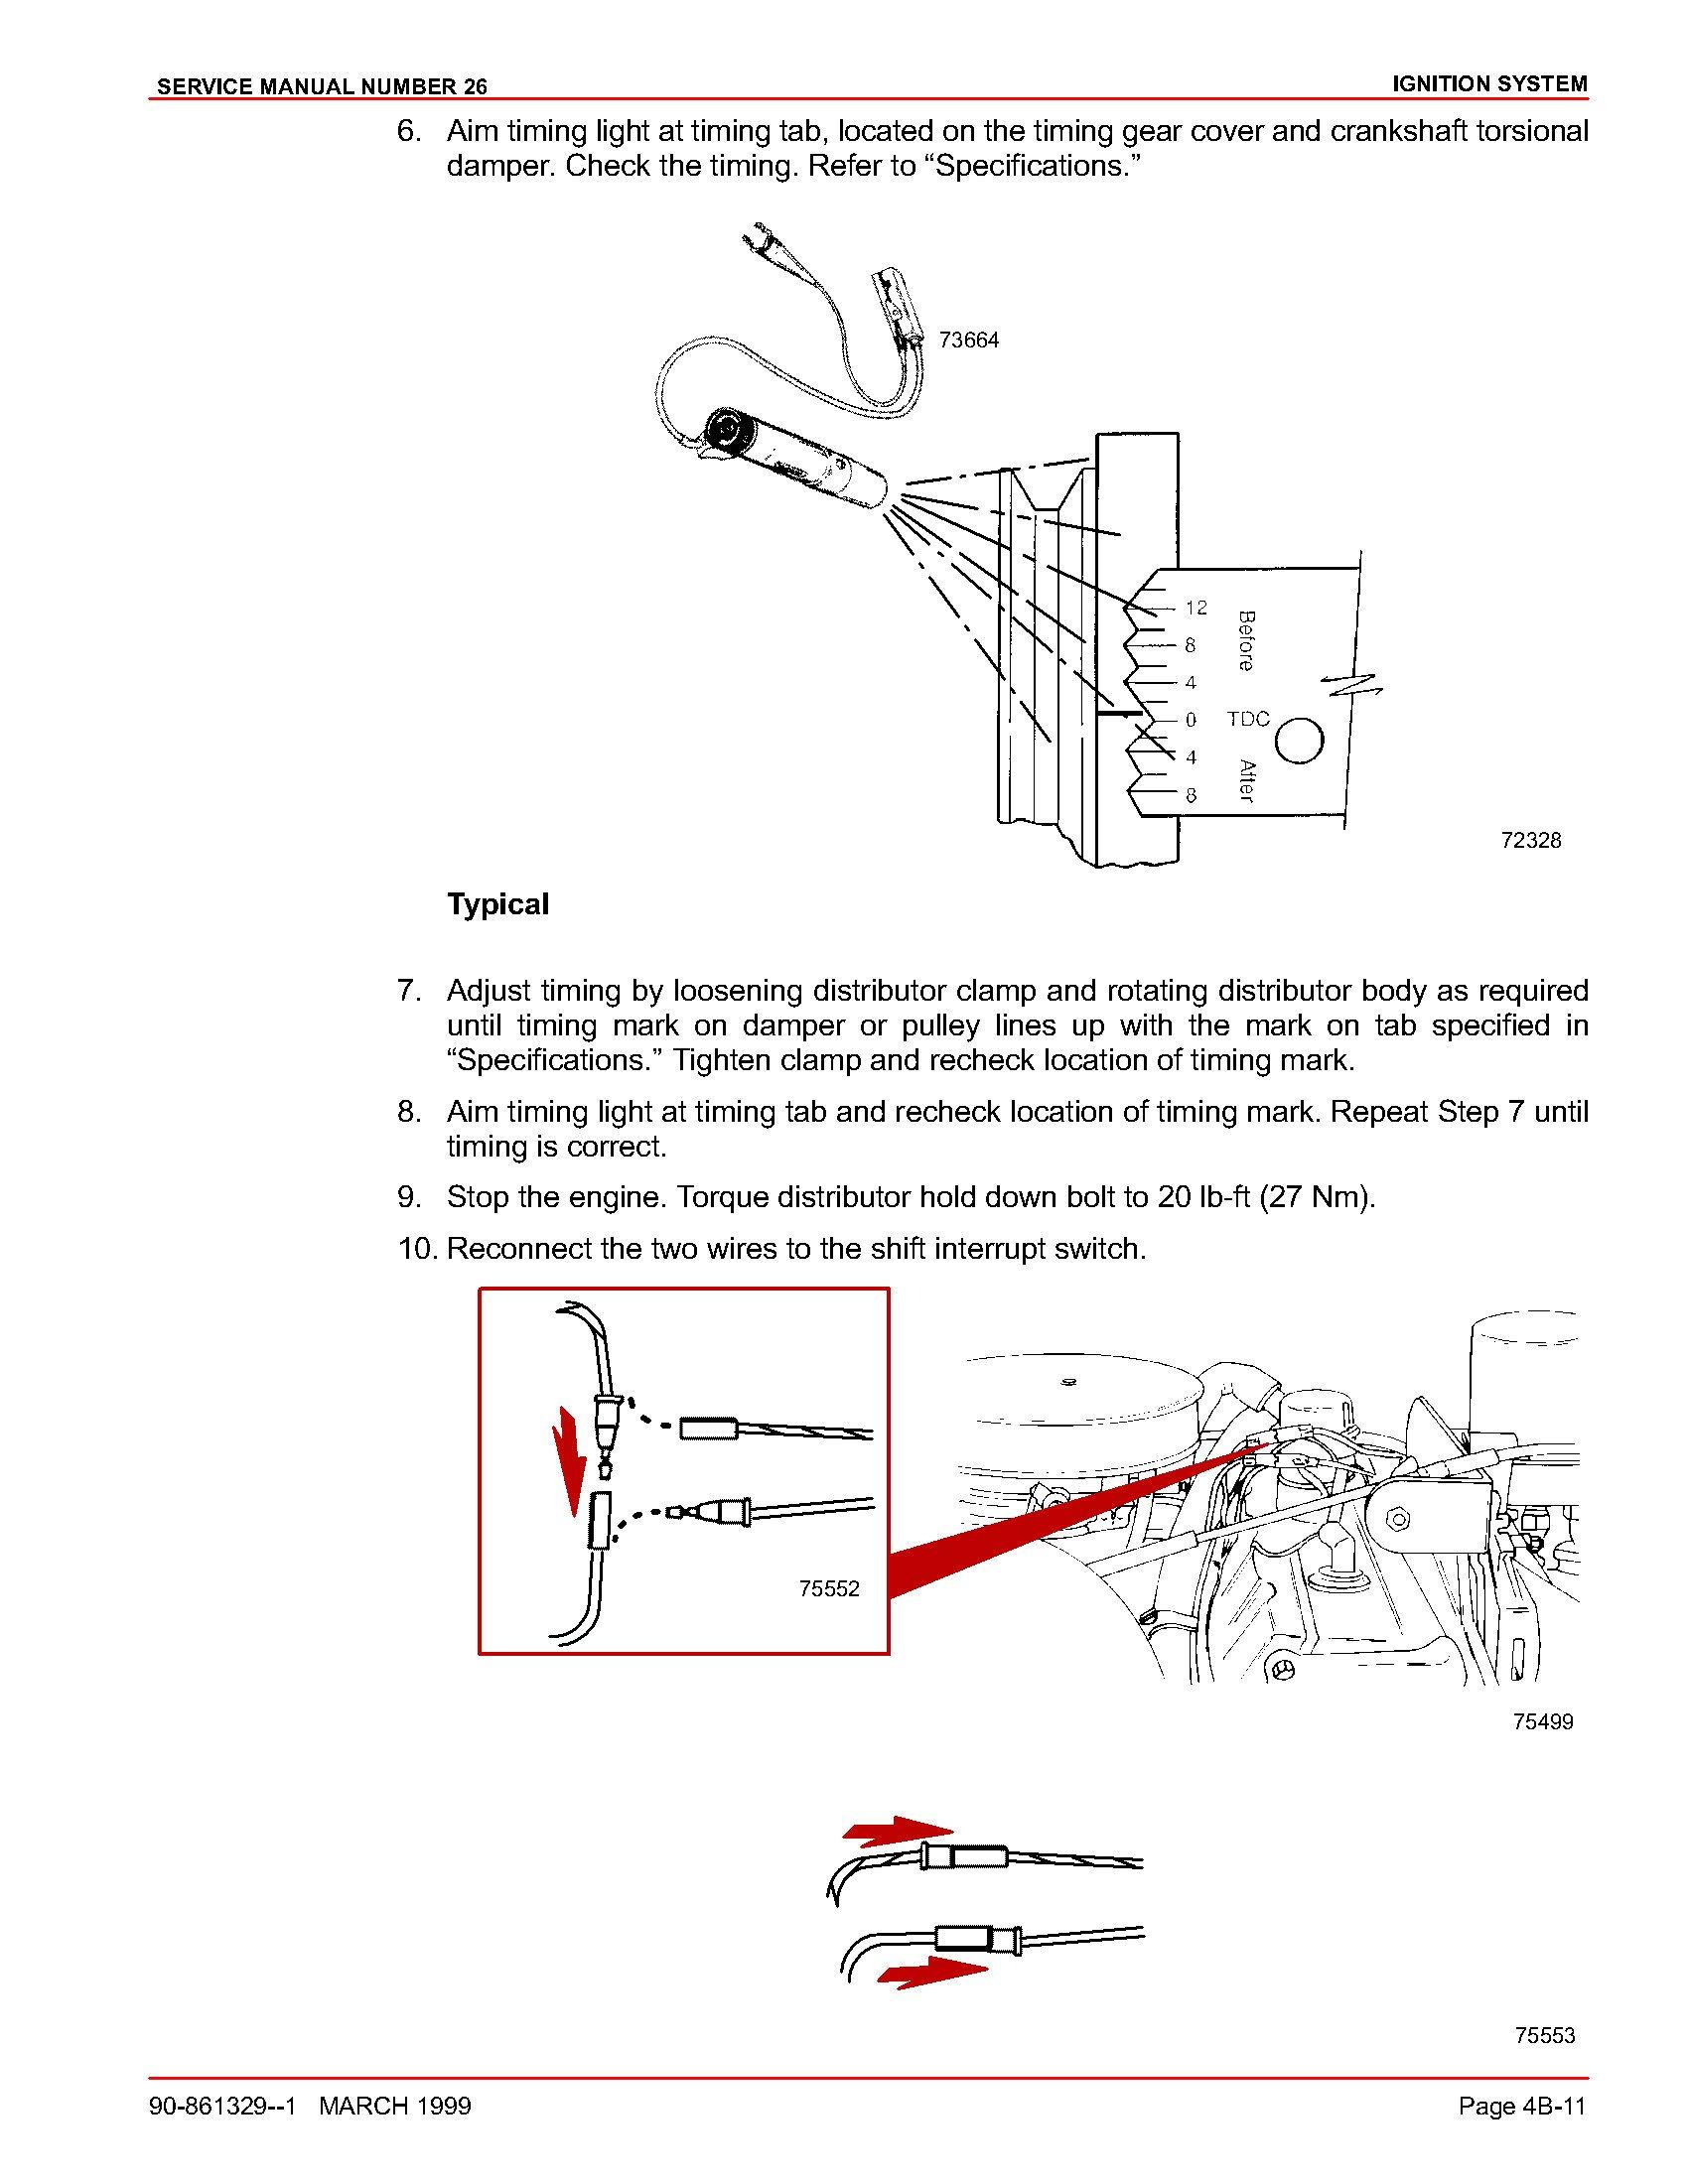 2012-12-01_042818_t3  Mercruiser Wire Harness Diagram on omc cobra 3.0 diagram, volvo penta 3.0 diagram, ford 3.0 diagram, toyota 3.0 diagram,